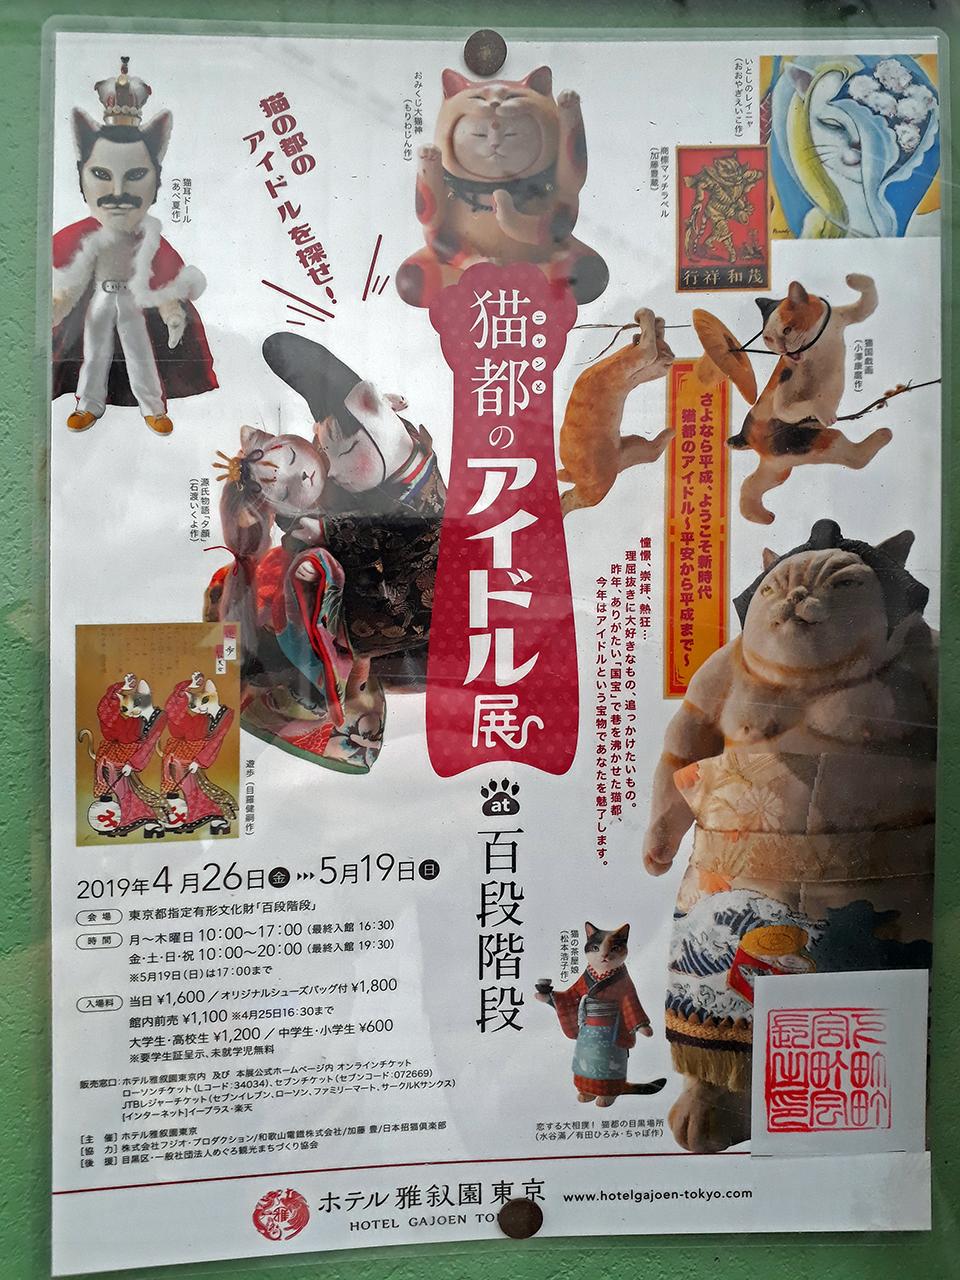 Japan Meguro Hotel Gajoen Cat Art Exhibition Flyer